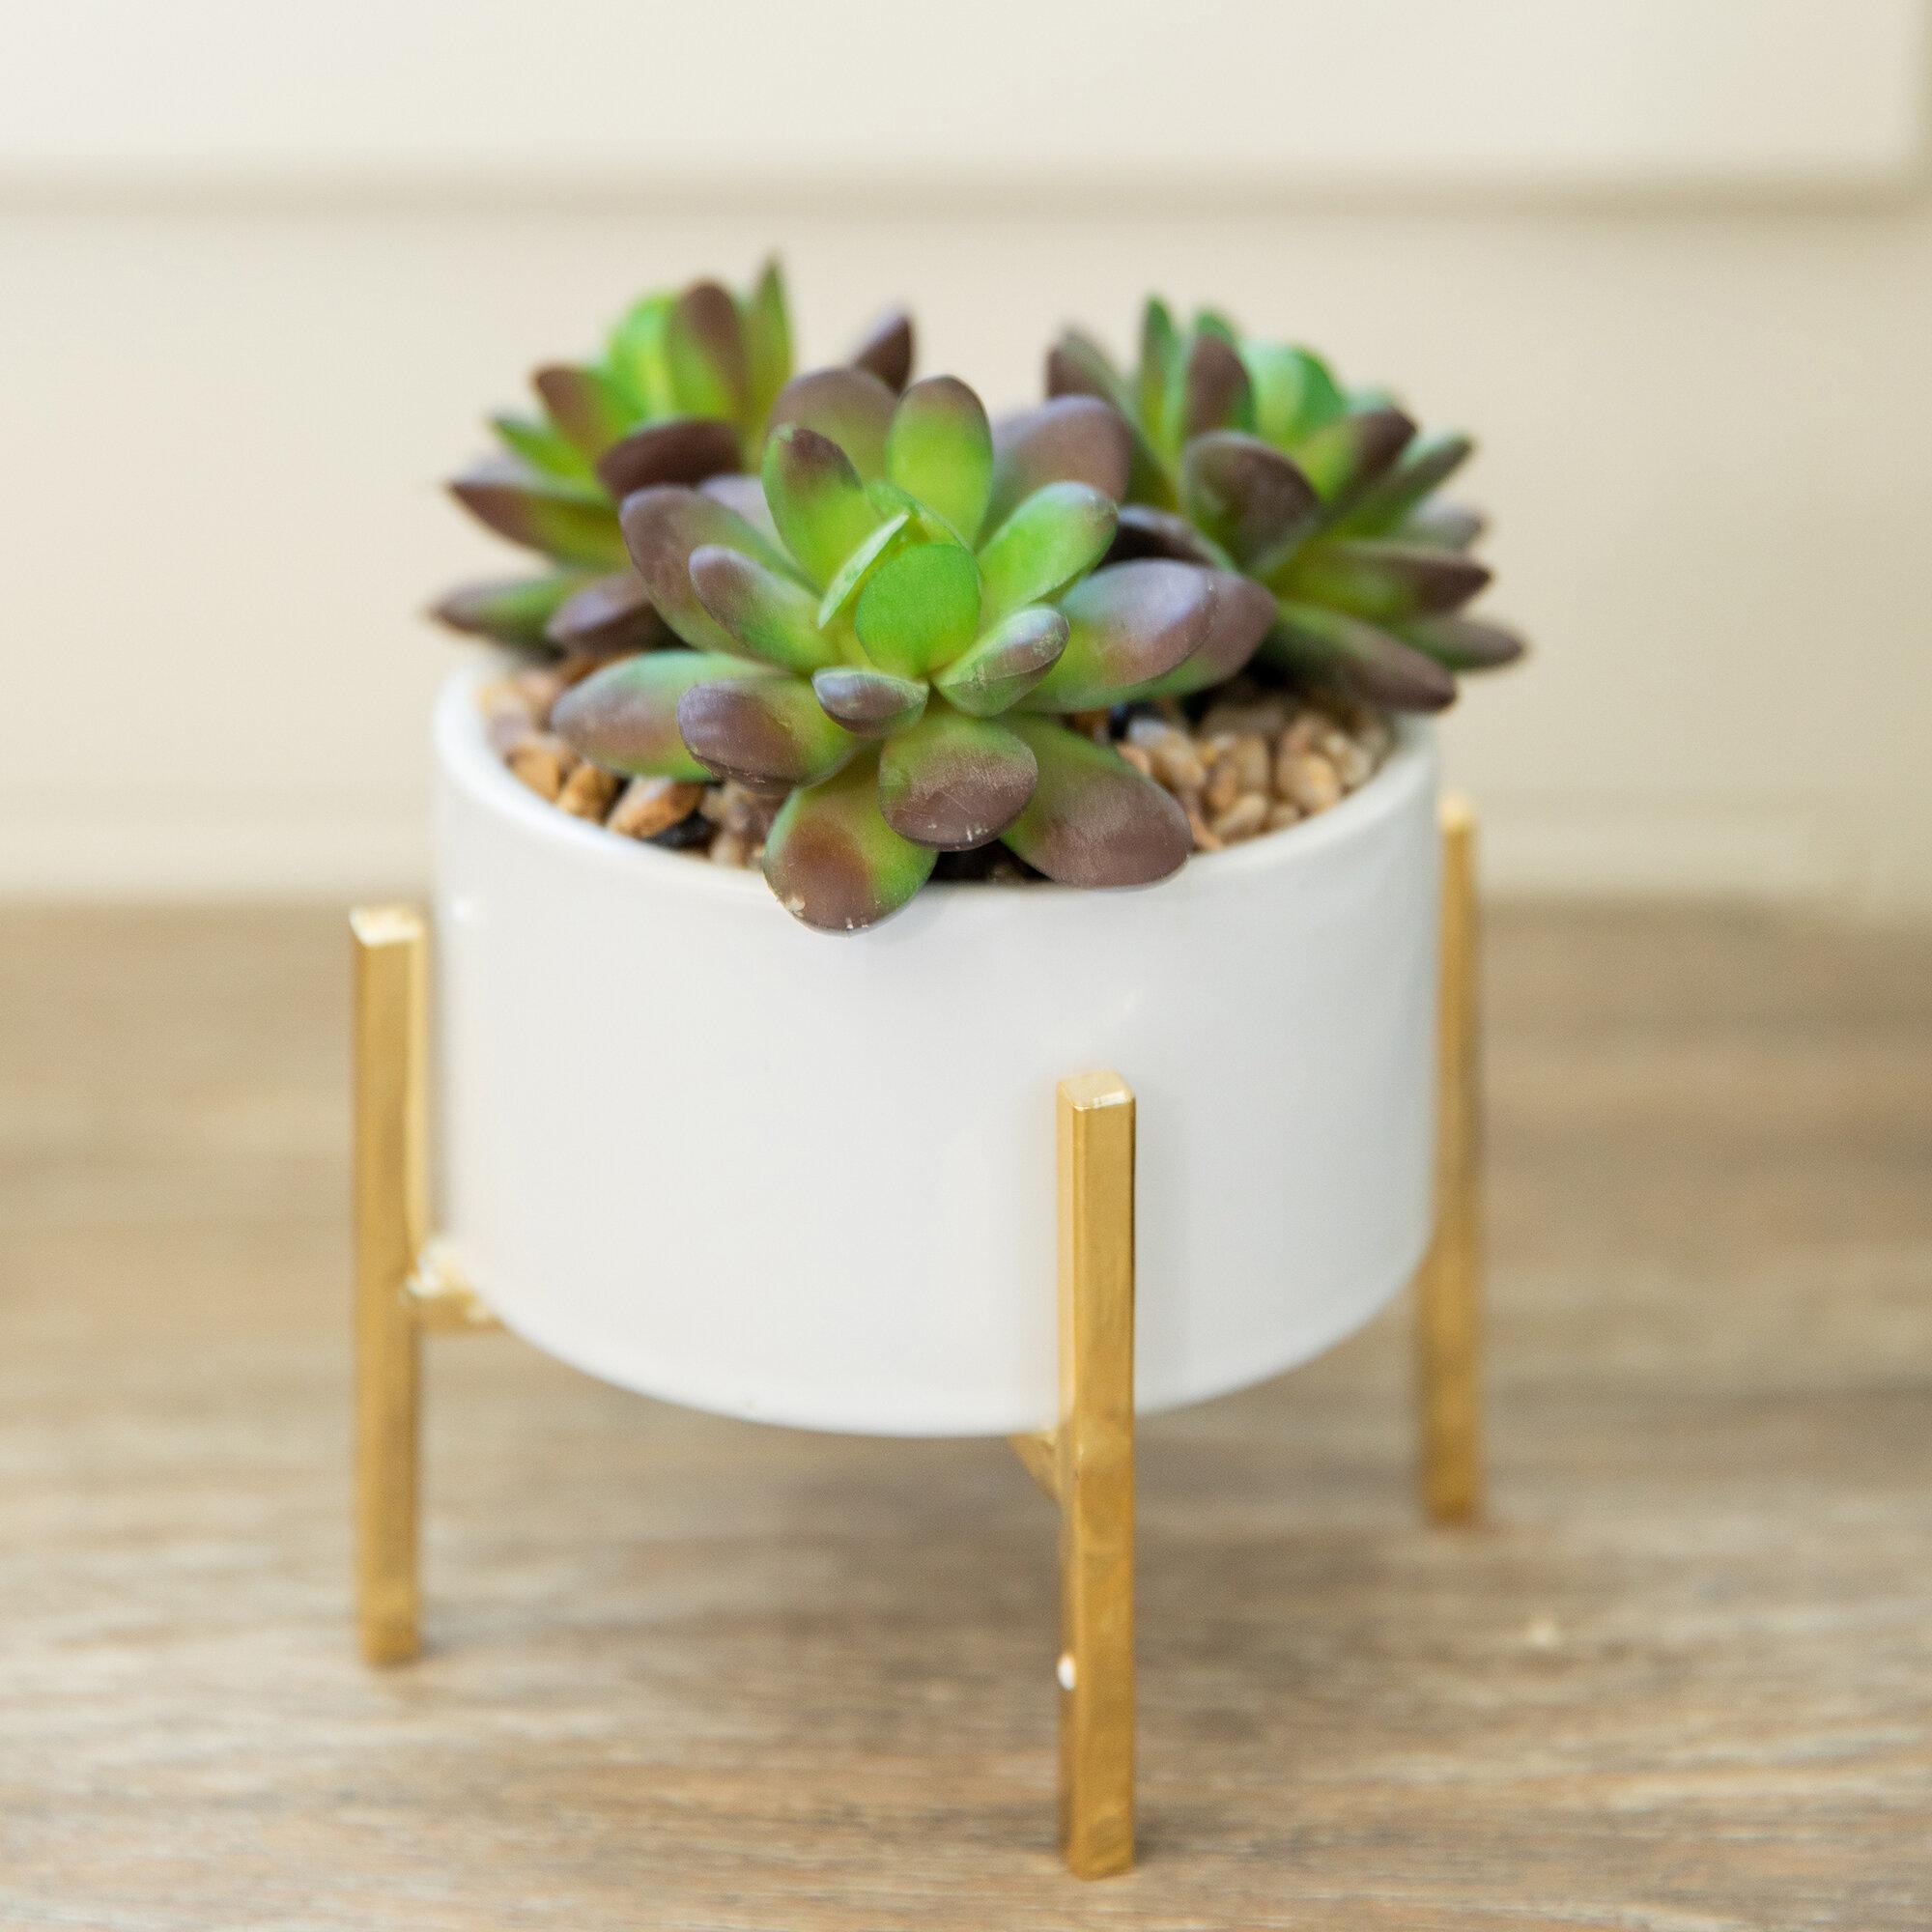 Ebern Designs Mix Stand Desktop Succulent Plant In Pot Reviews Wayfair